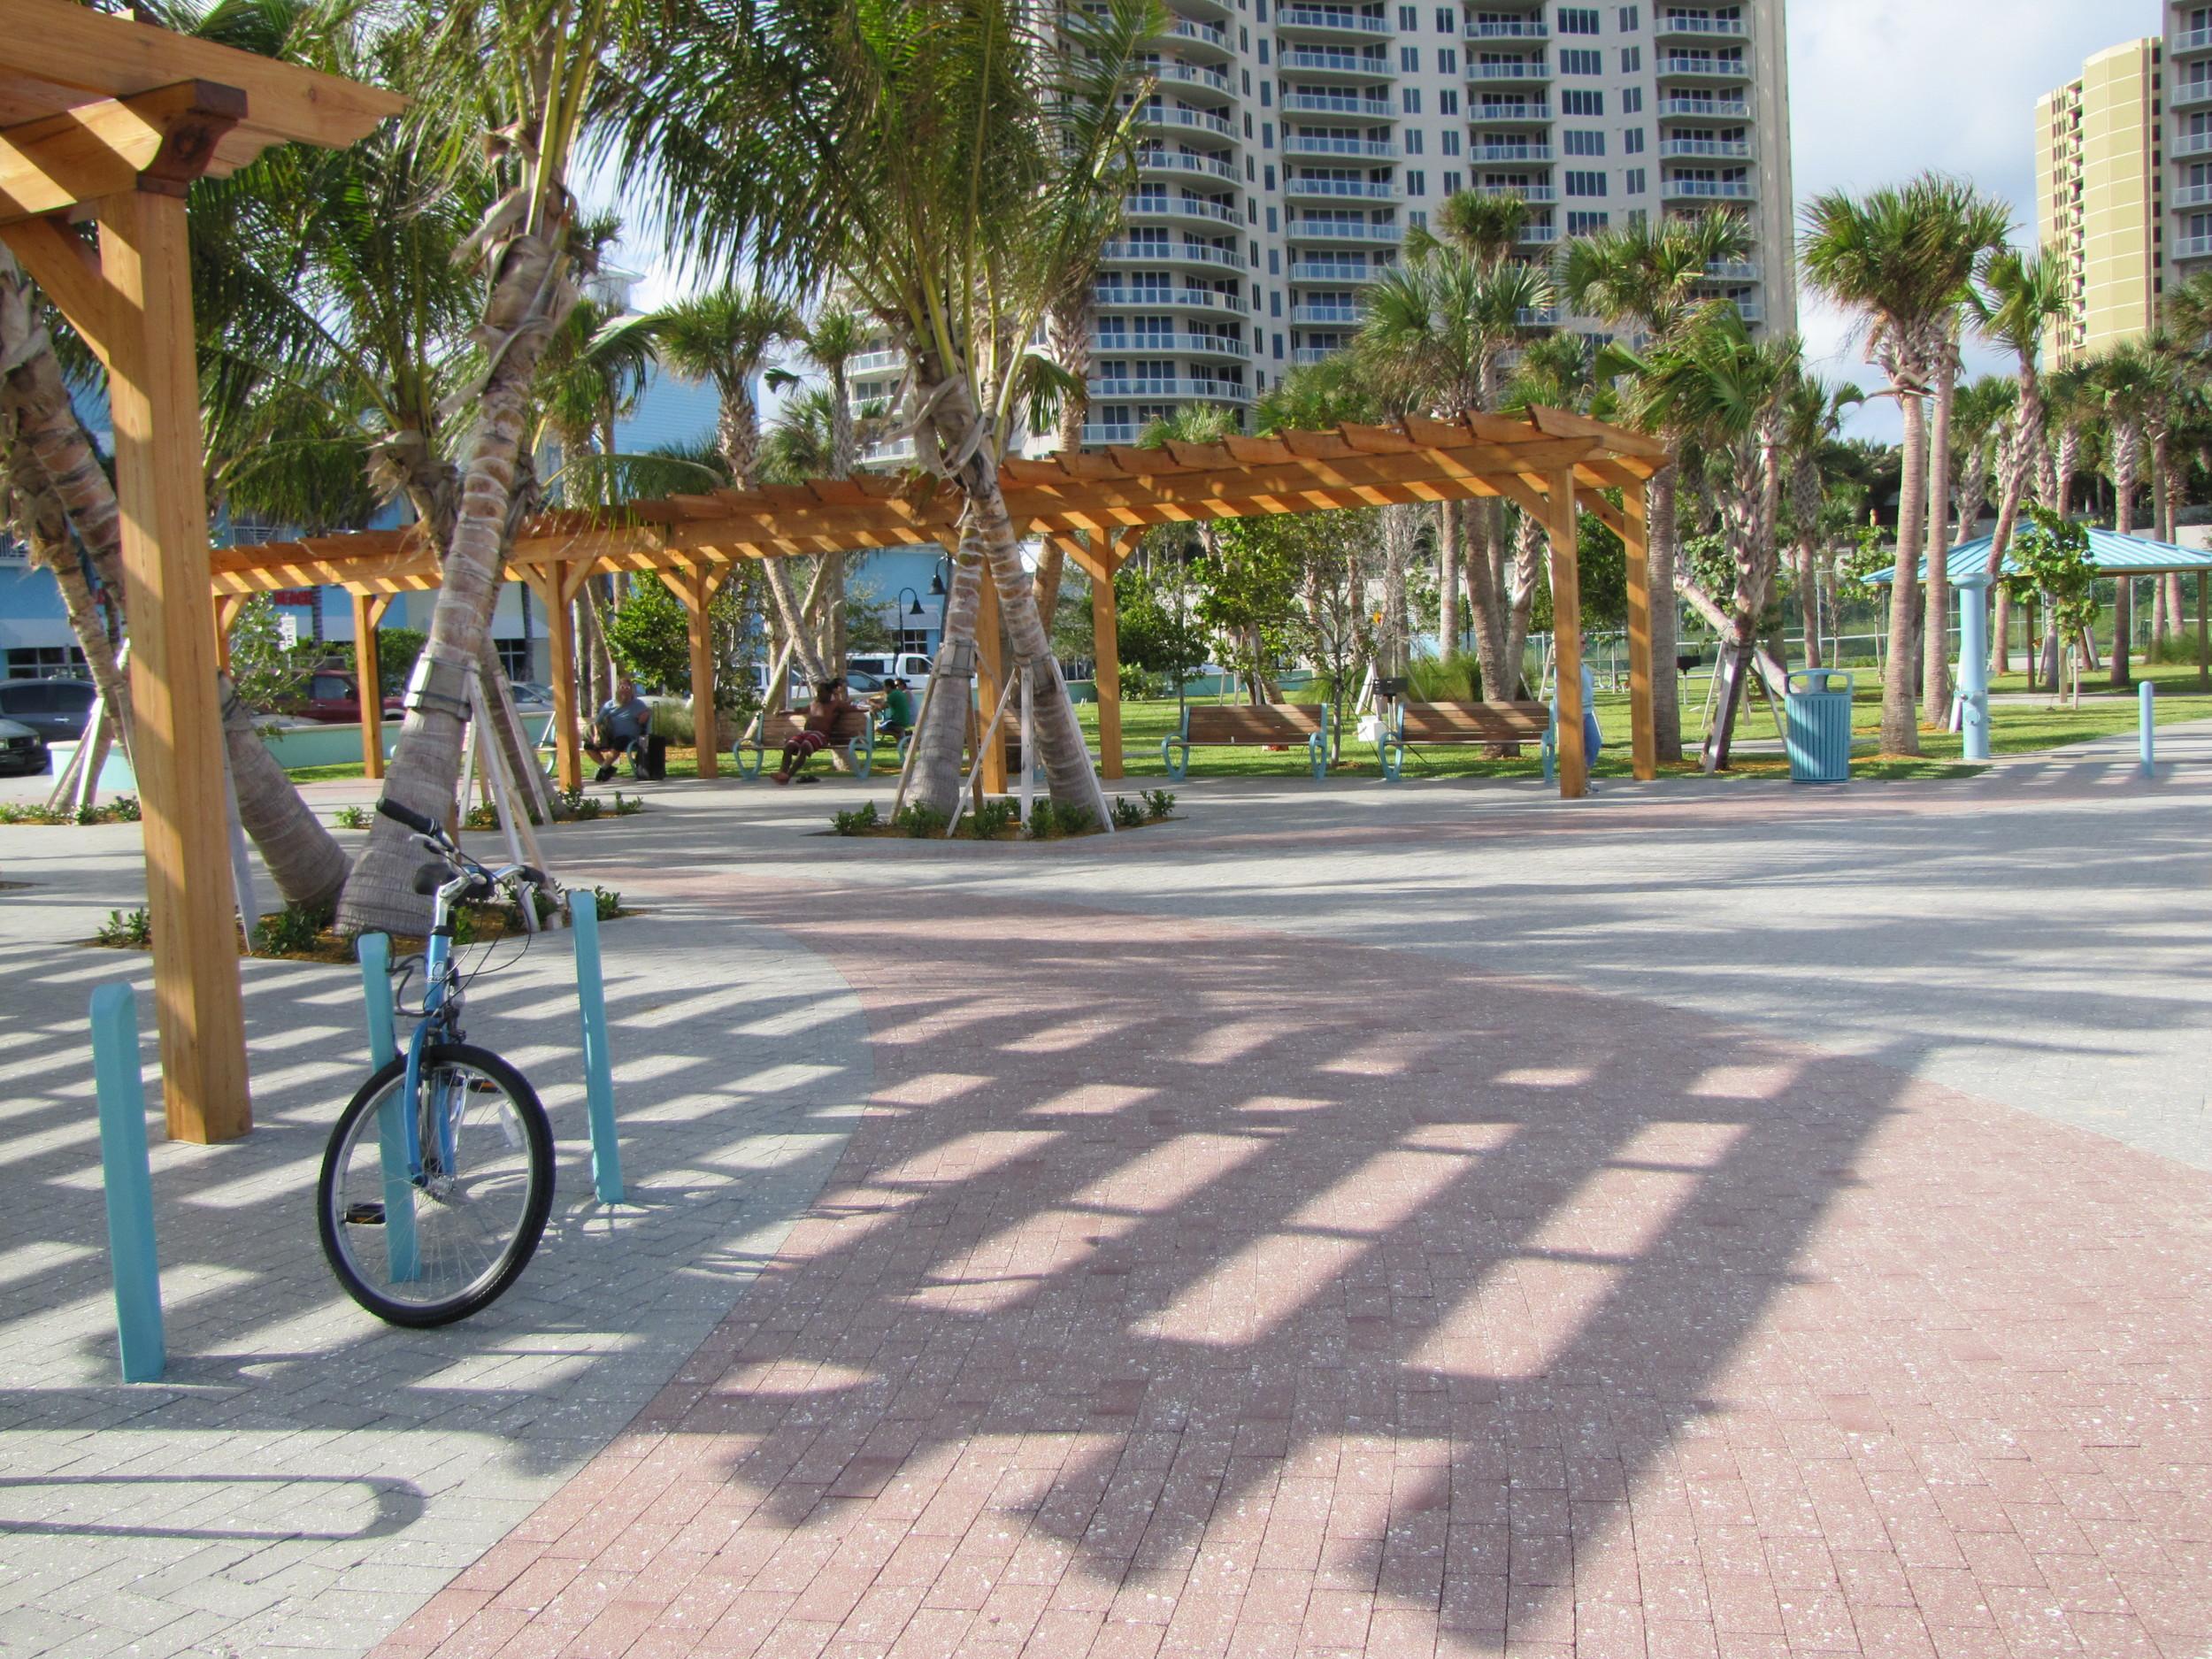 City of Riviera Beach Municipal Beach Park Ocean Mall Trellis and Bike Colored Concrete Pavers.jpg